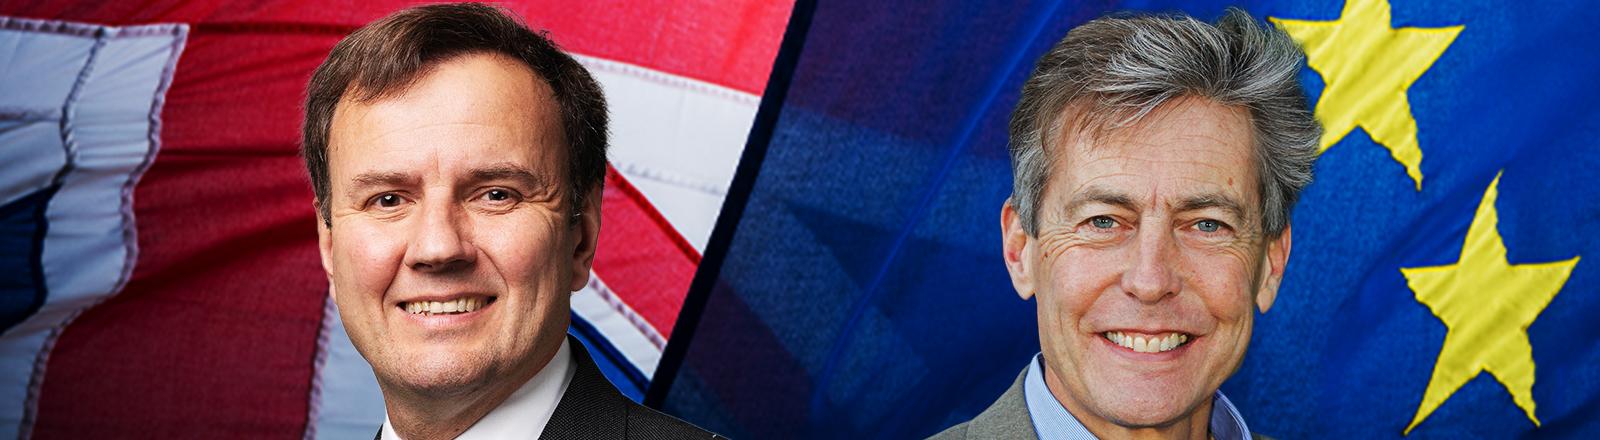 Greg Hands (links) und Ben Bradshaw (rechts)